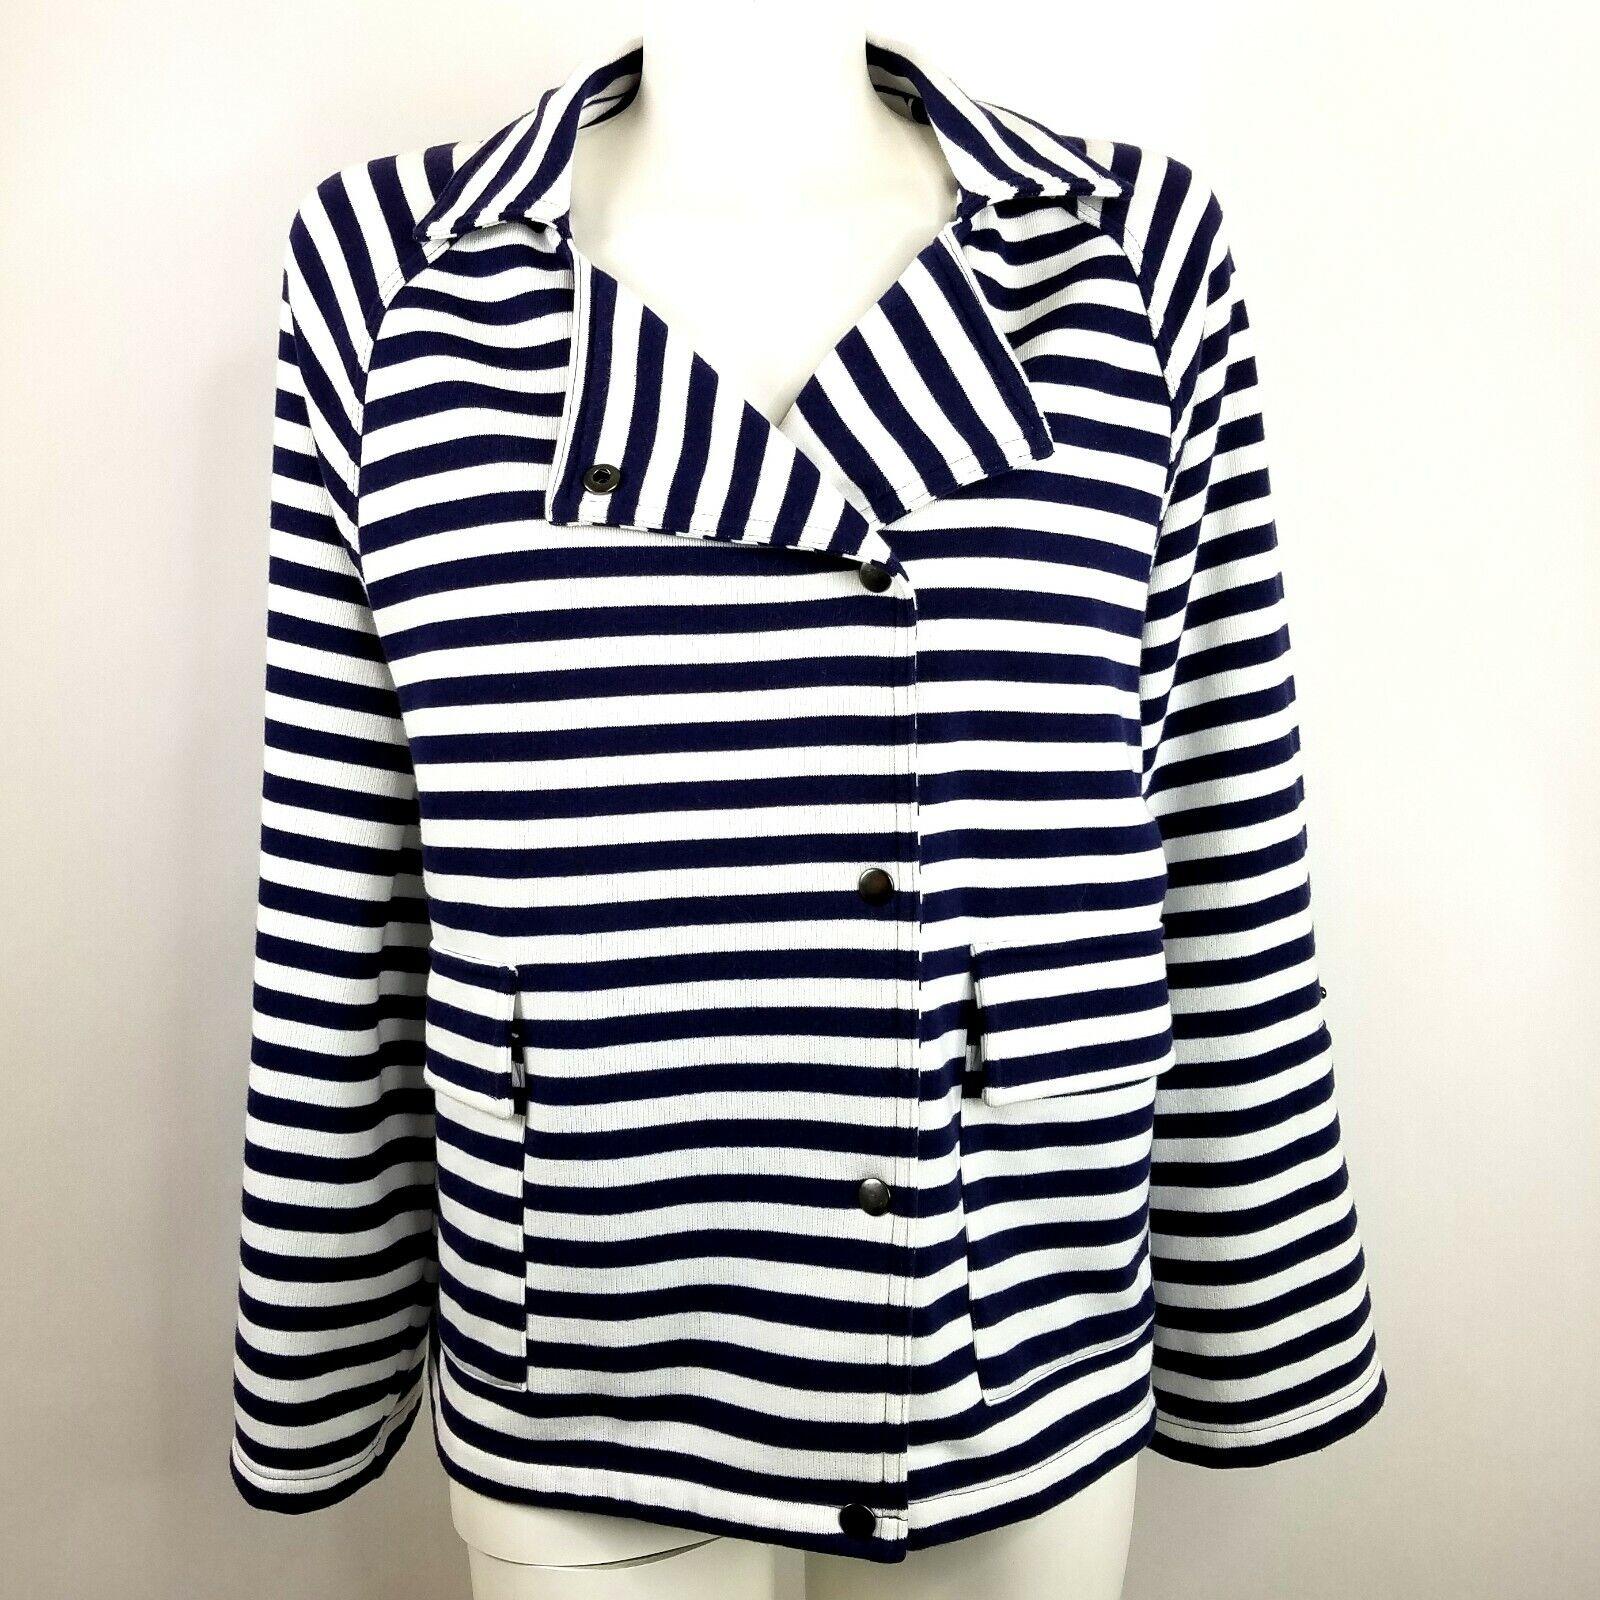 Liz Claiborne Knit Cardigan Sweater bluee White Stripe Snaps Soft Comfy Size L